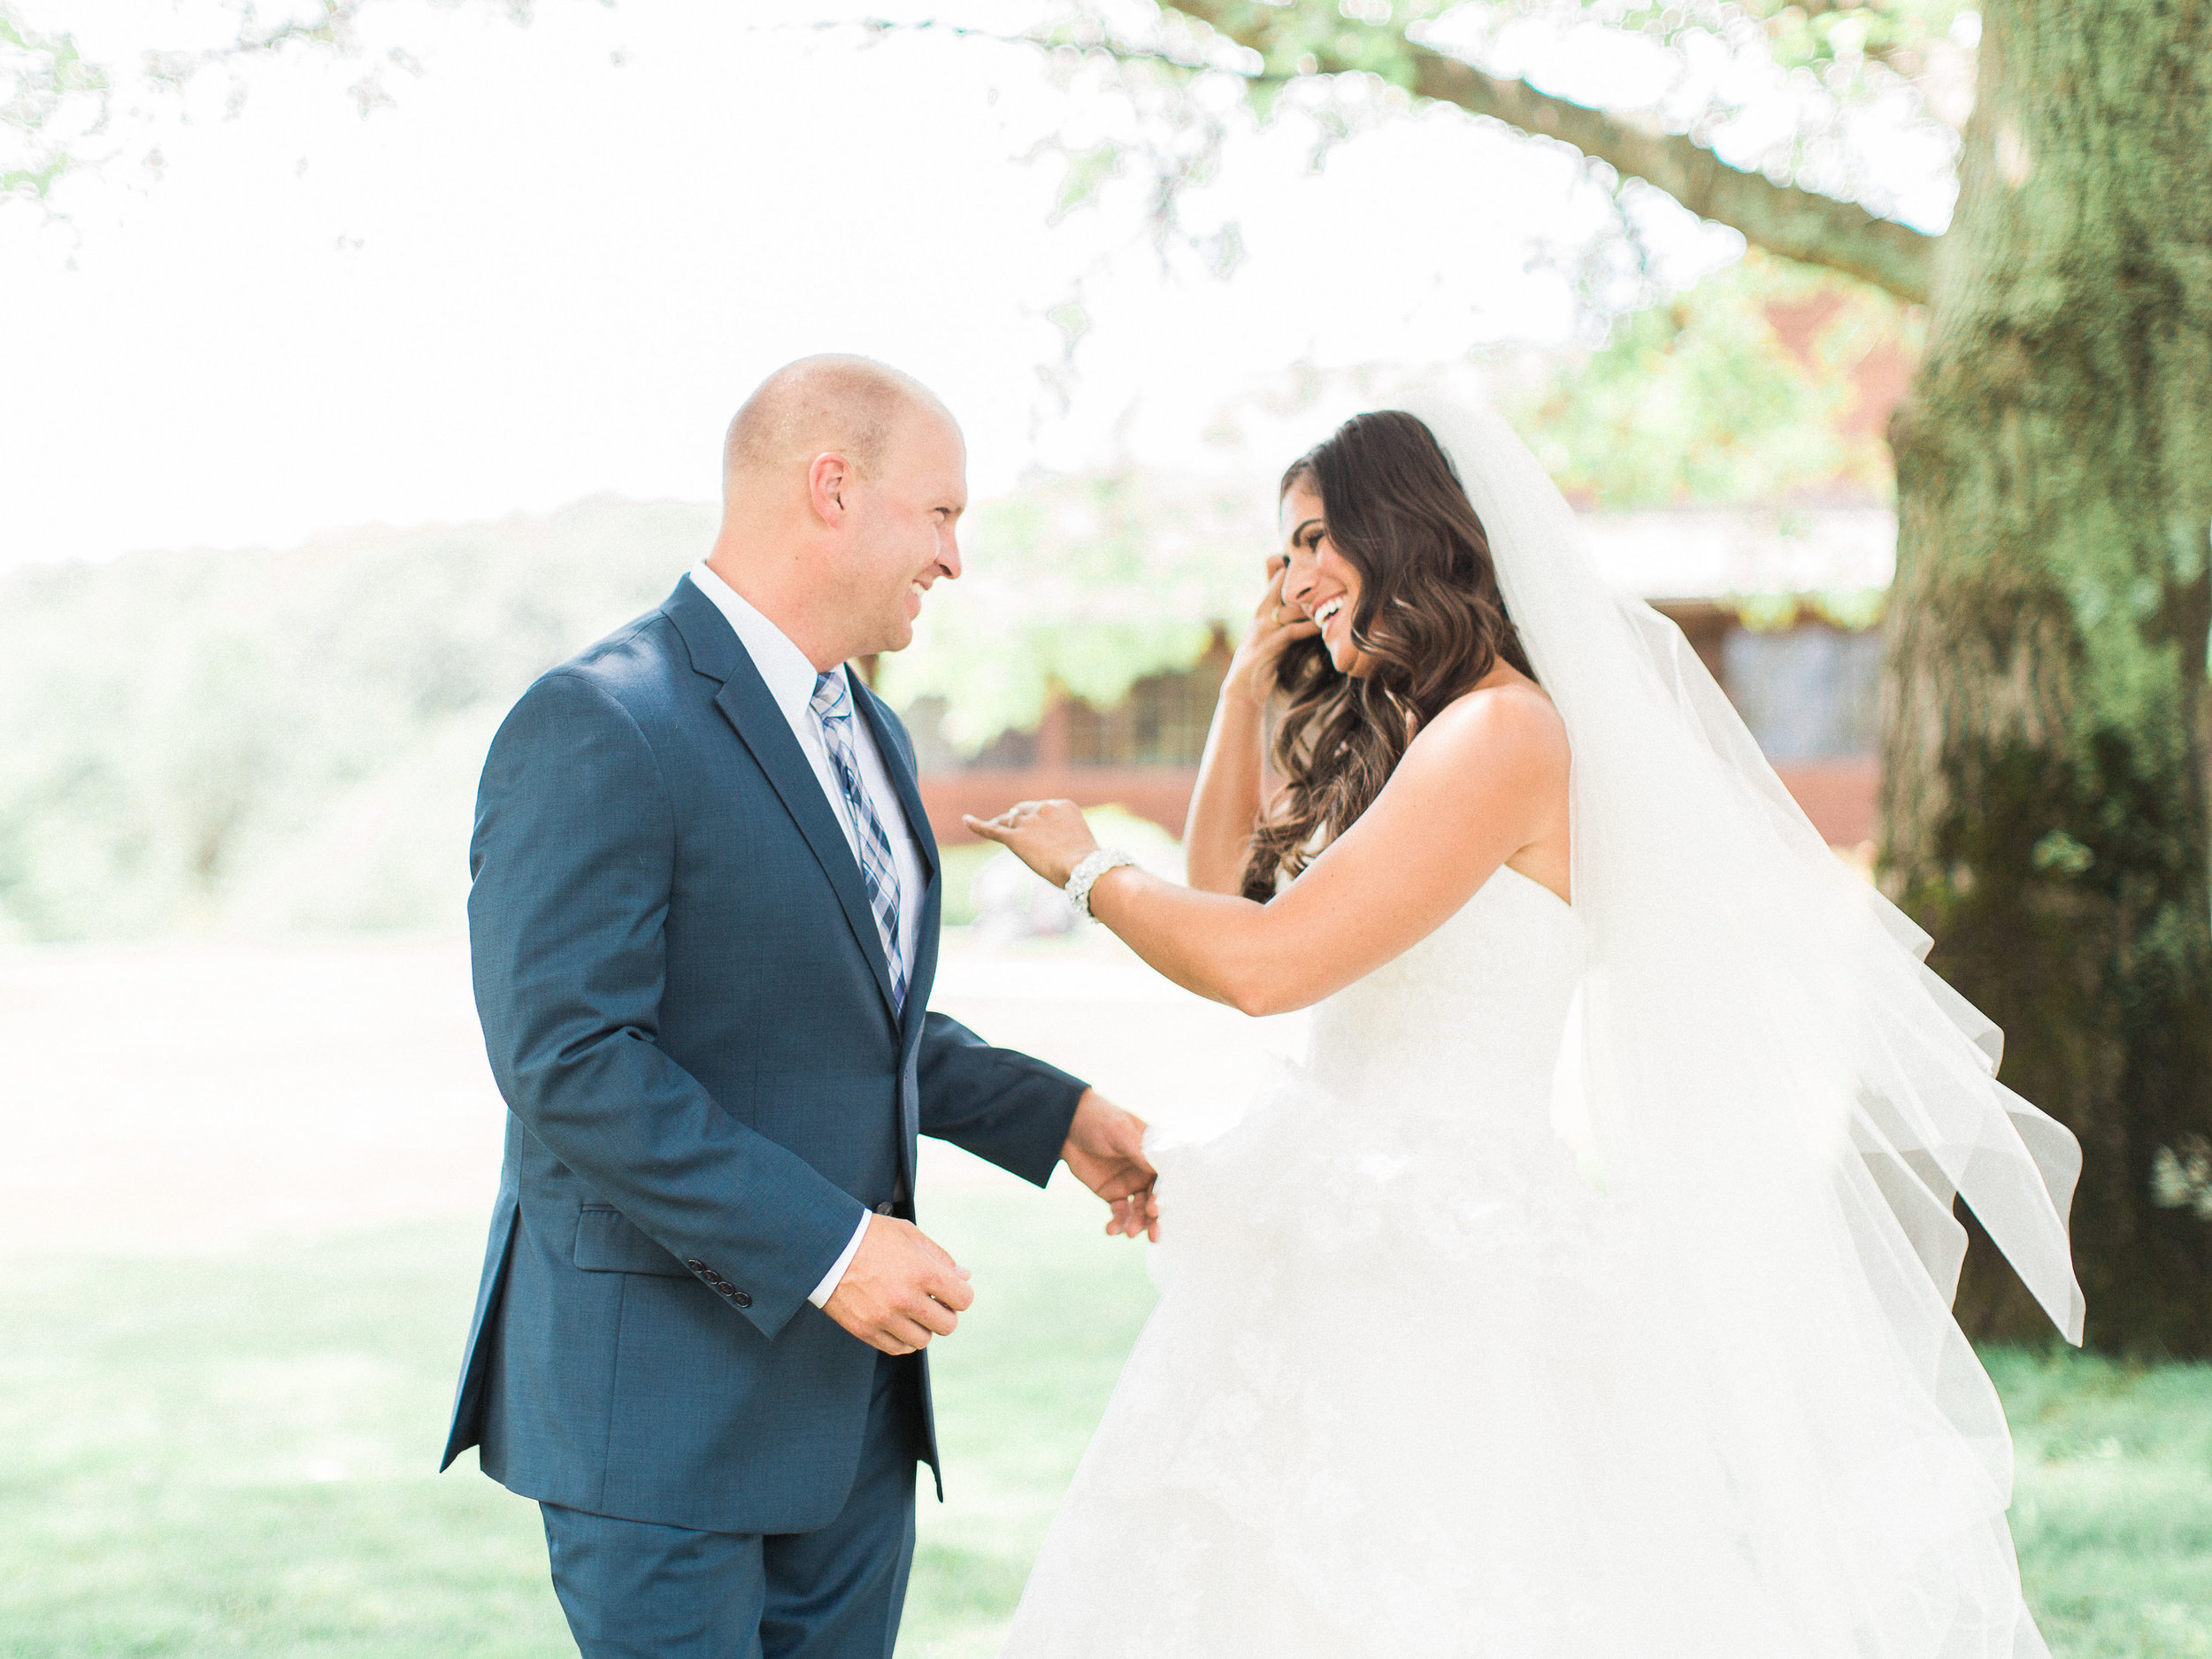 ERIC AND HALLIE WEDDING-HI RESOLUTION FOR PRINTING-0224.jpg